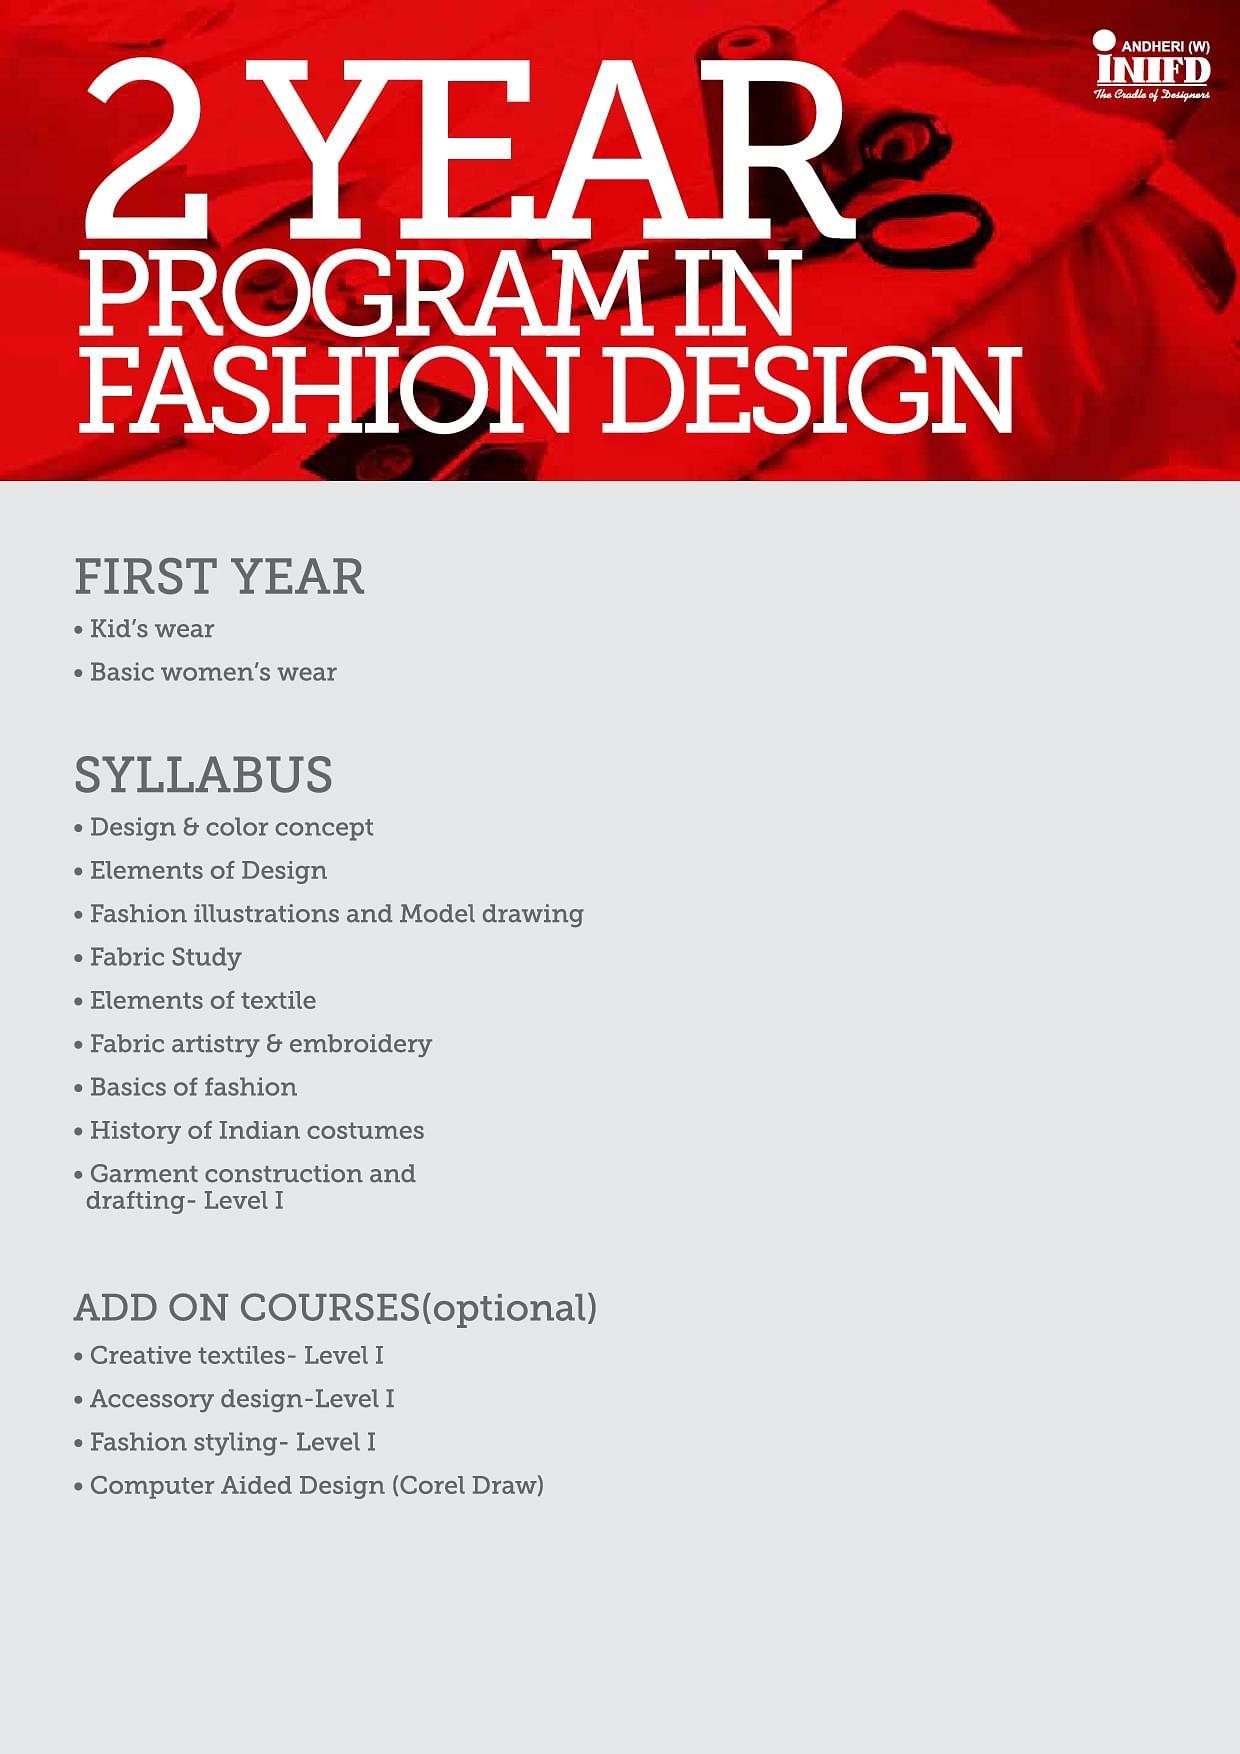 Inifd International Institute Of Fashion Design